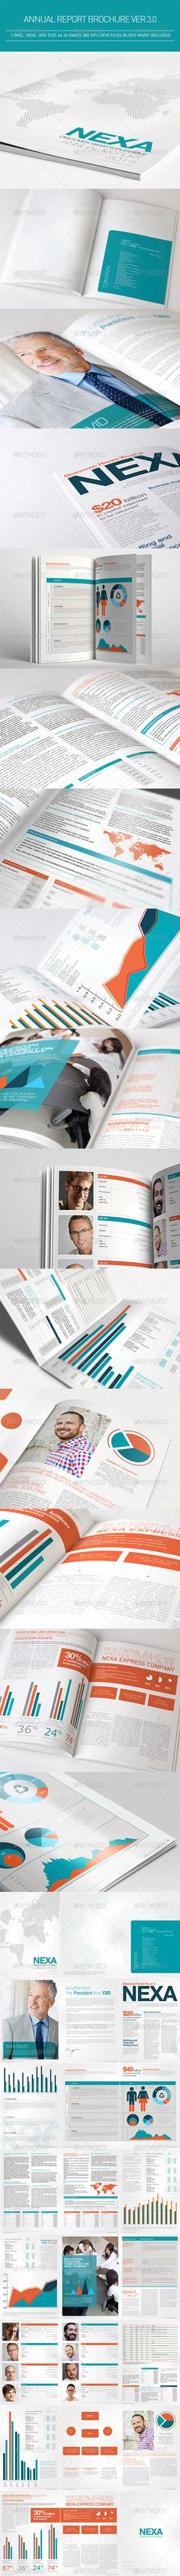 #Annual Report Brochure Ver 3.0 - #Corporate #Brochures Download here: https://graphicriver.net/item/annual-report-brochure-ver-30/4280498?ref=alena994